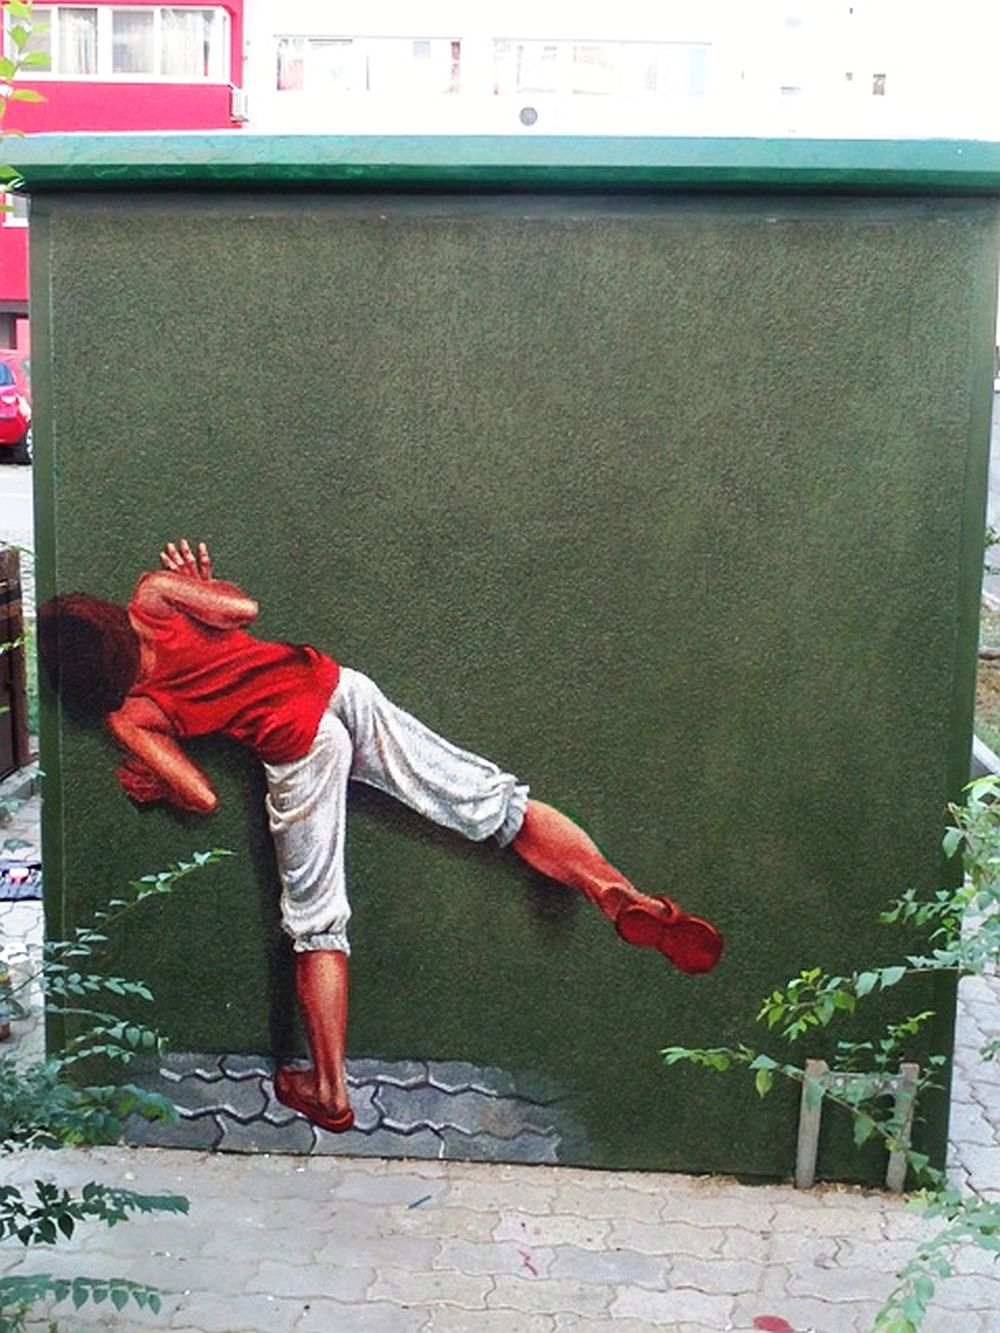 adelaparvu.com despre Sabin Chintoan si pictura urbana, Foto Sabin Chintoan (19)